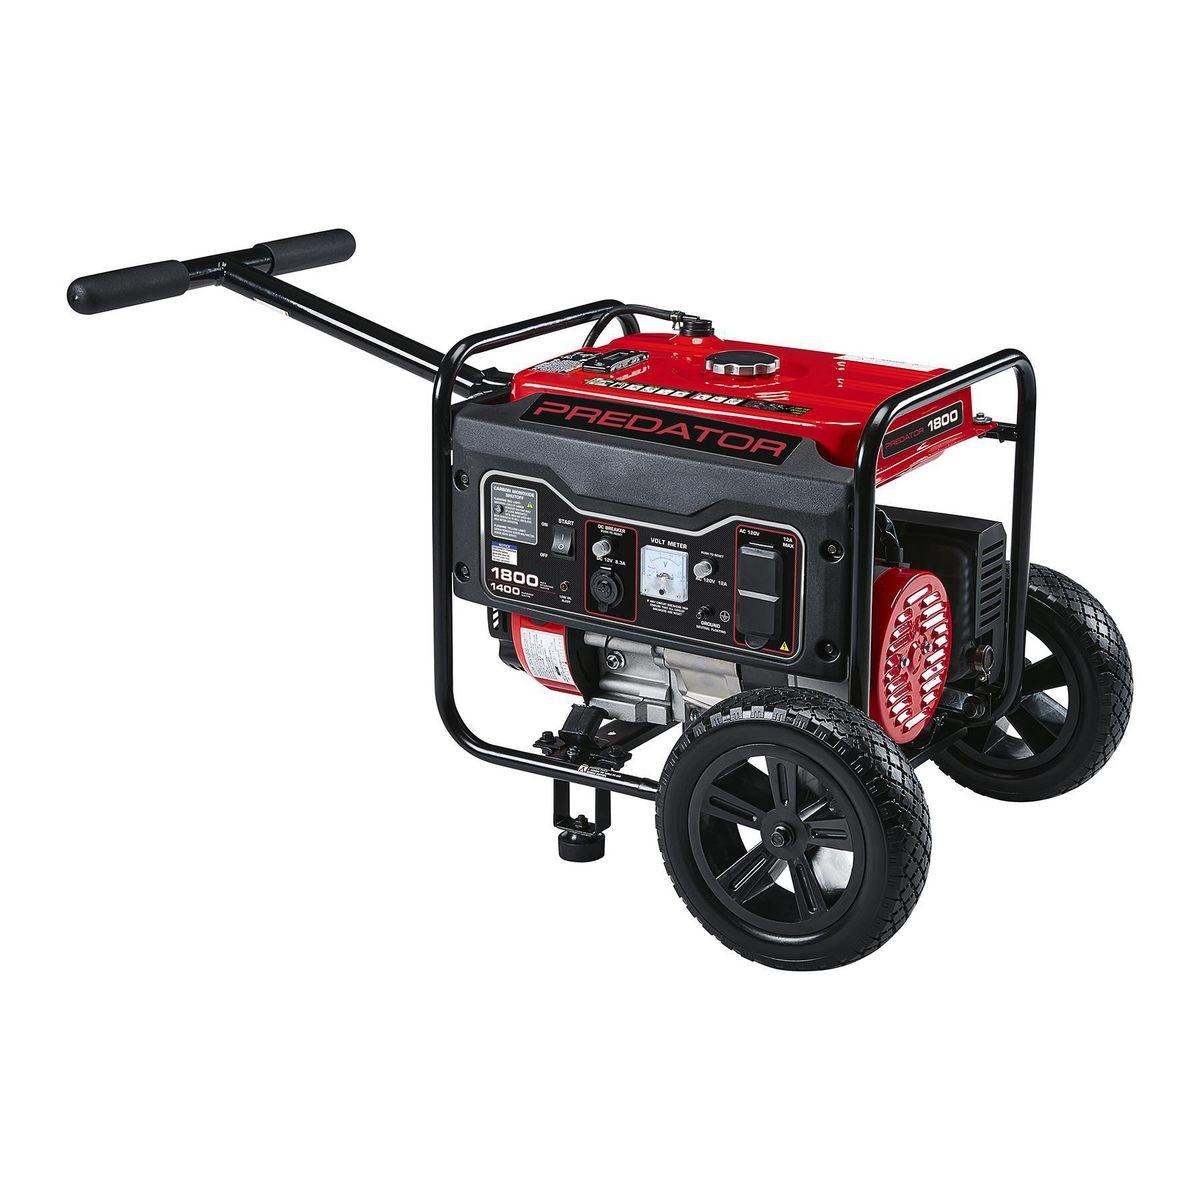 PREDATOR 1800 Watt Gas Powered Portable Generator With CO SECURE™ - Item 57064